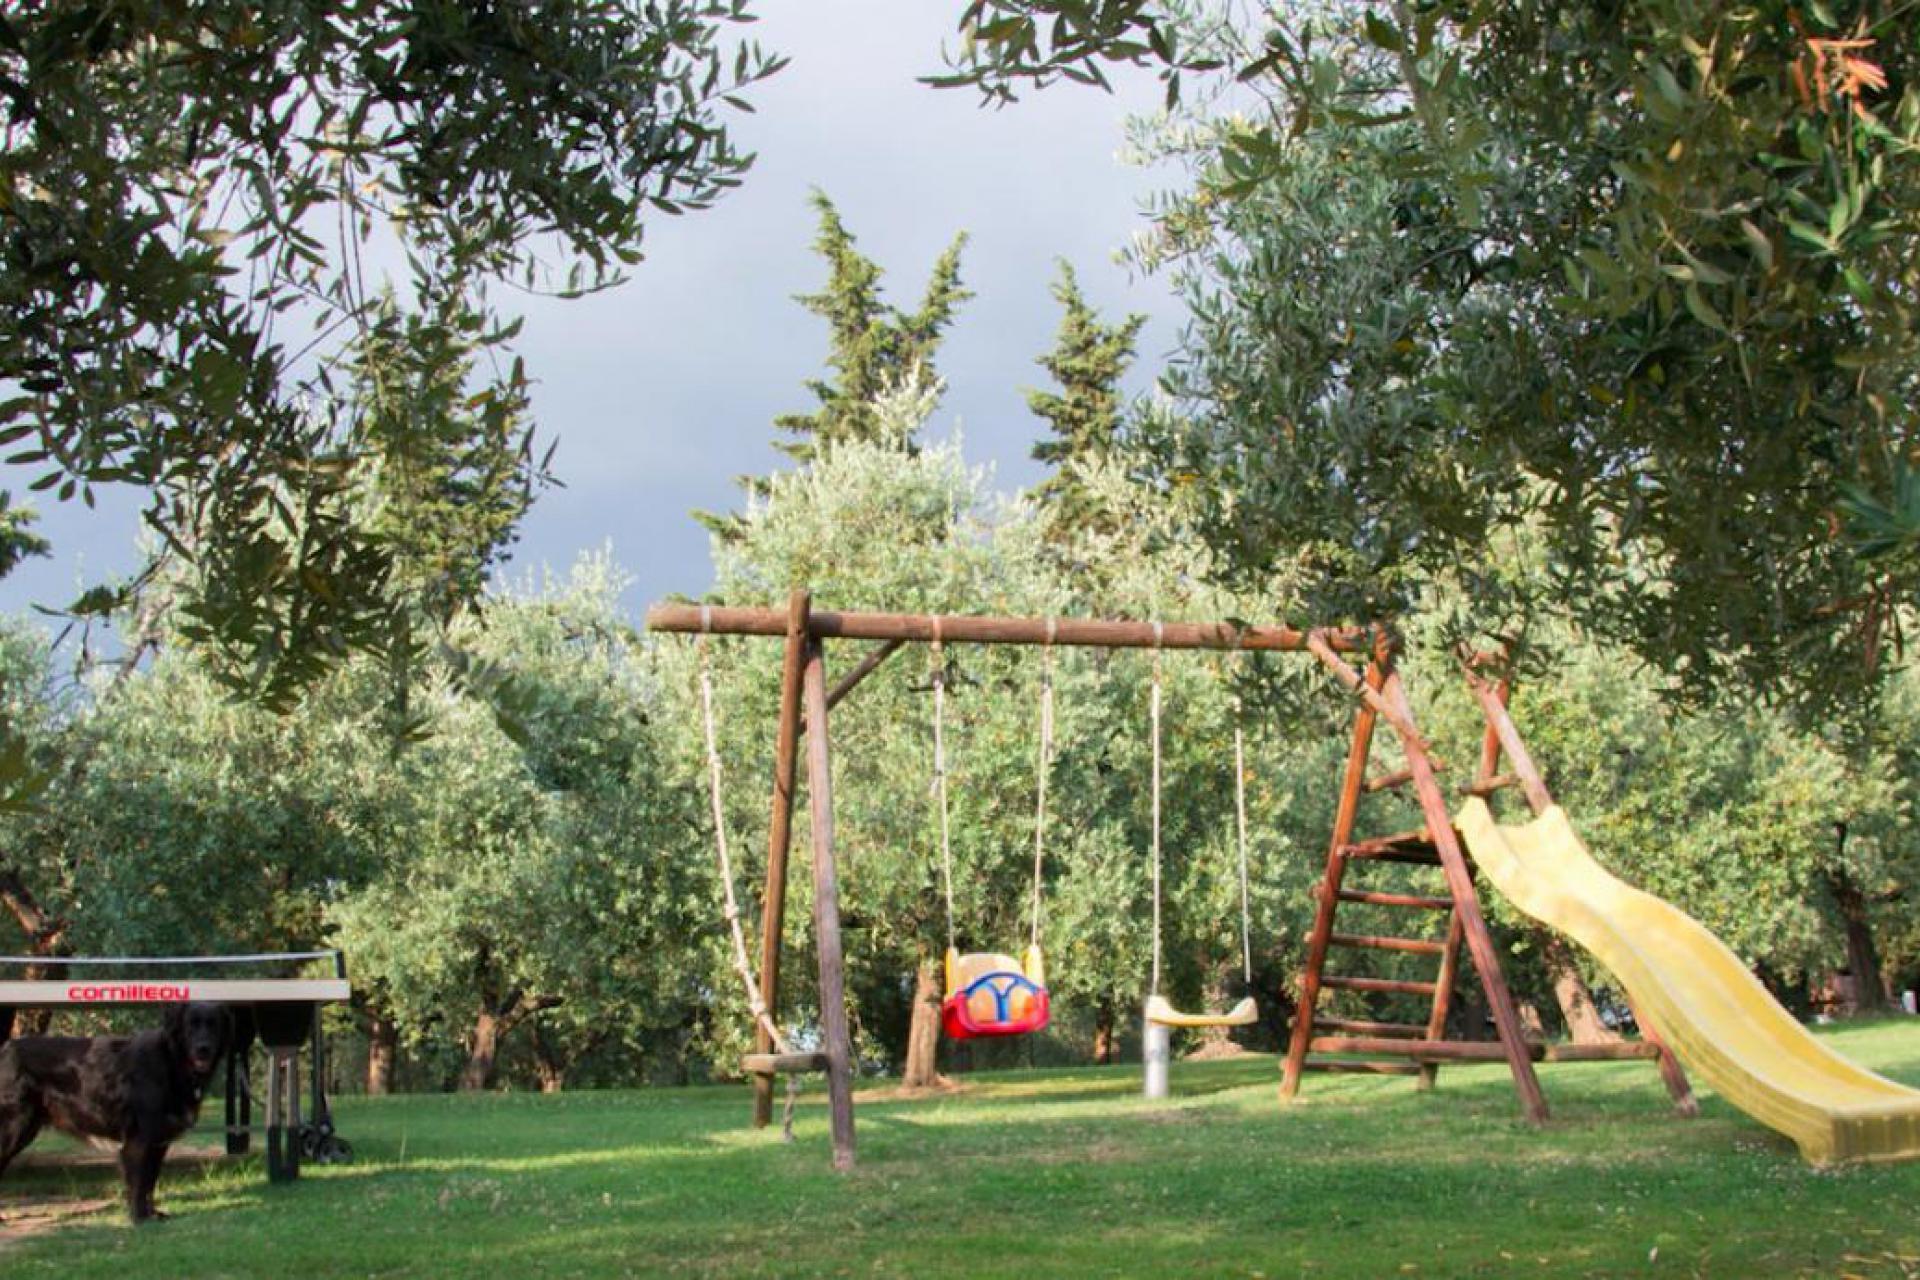 Agriturismo Tuscany Family friendly agriturismo near Lucca, Toscane